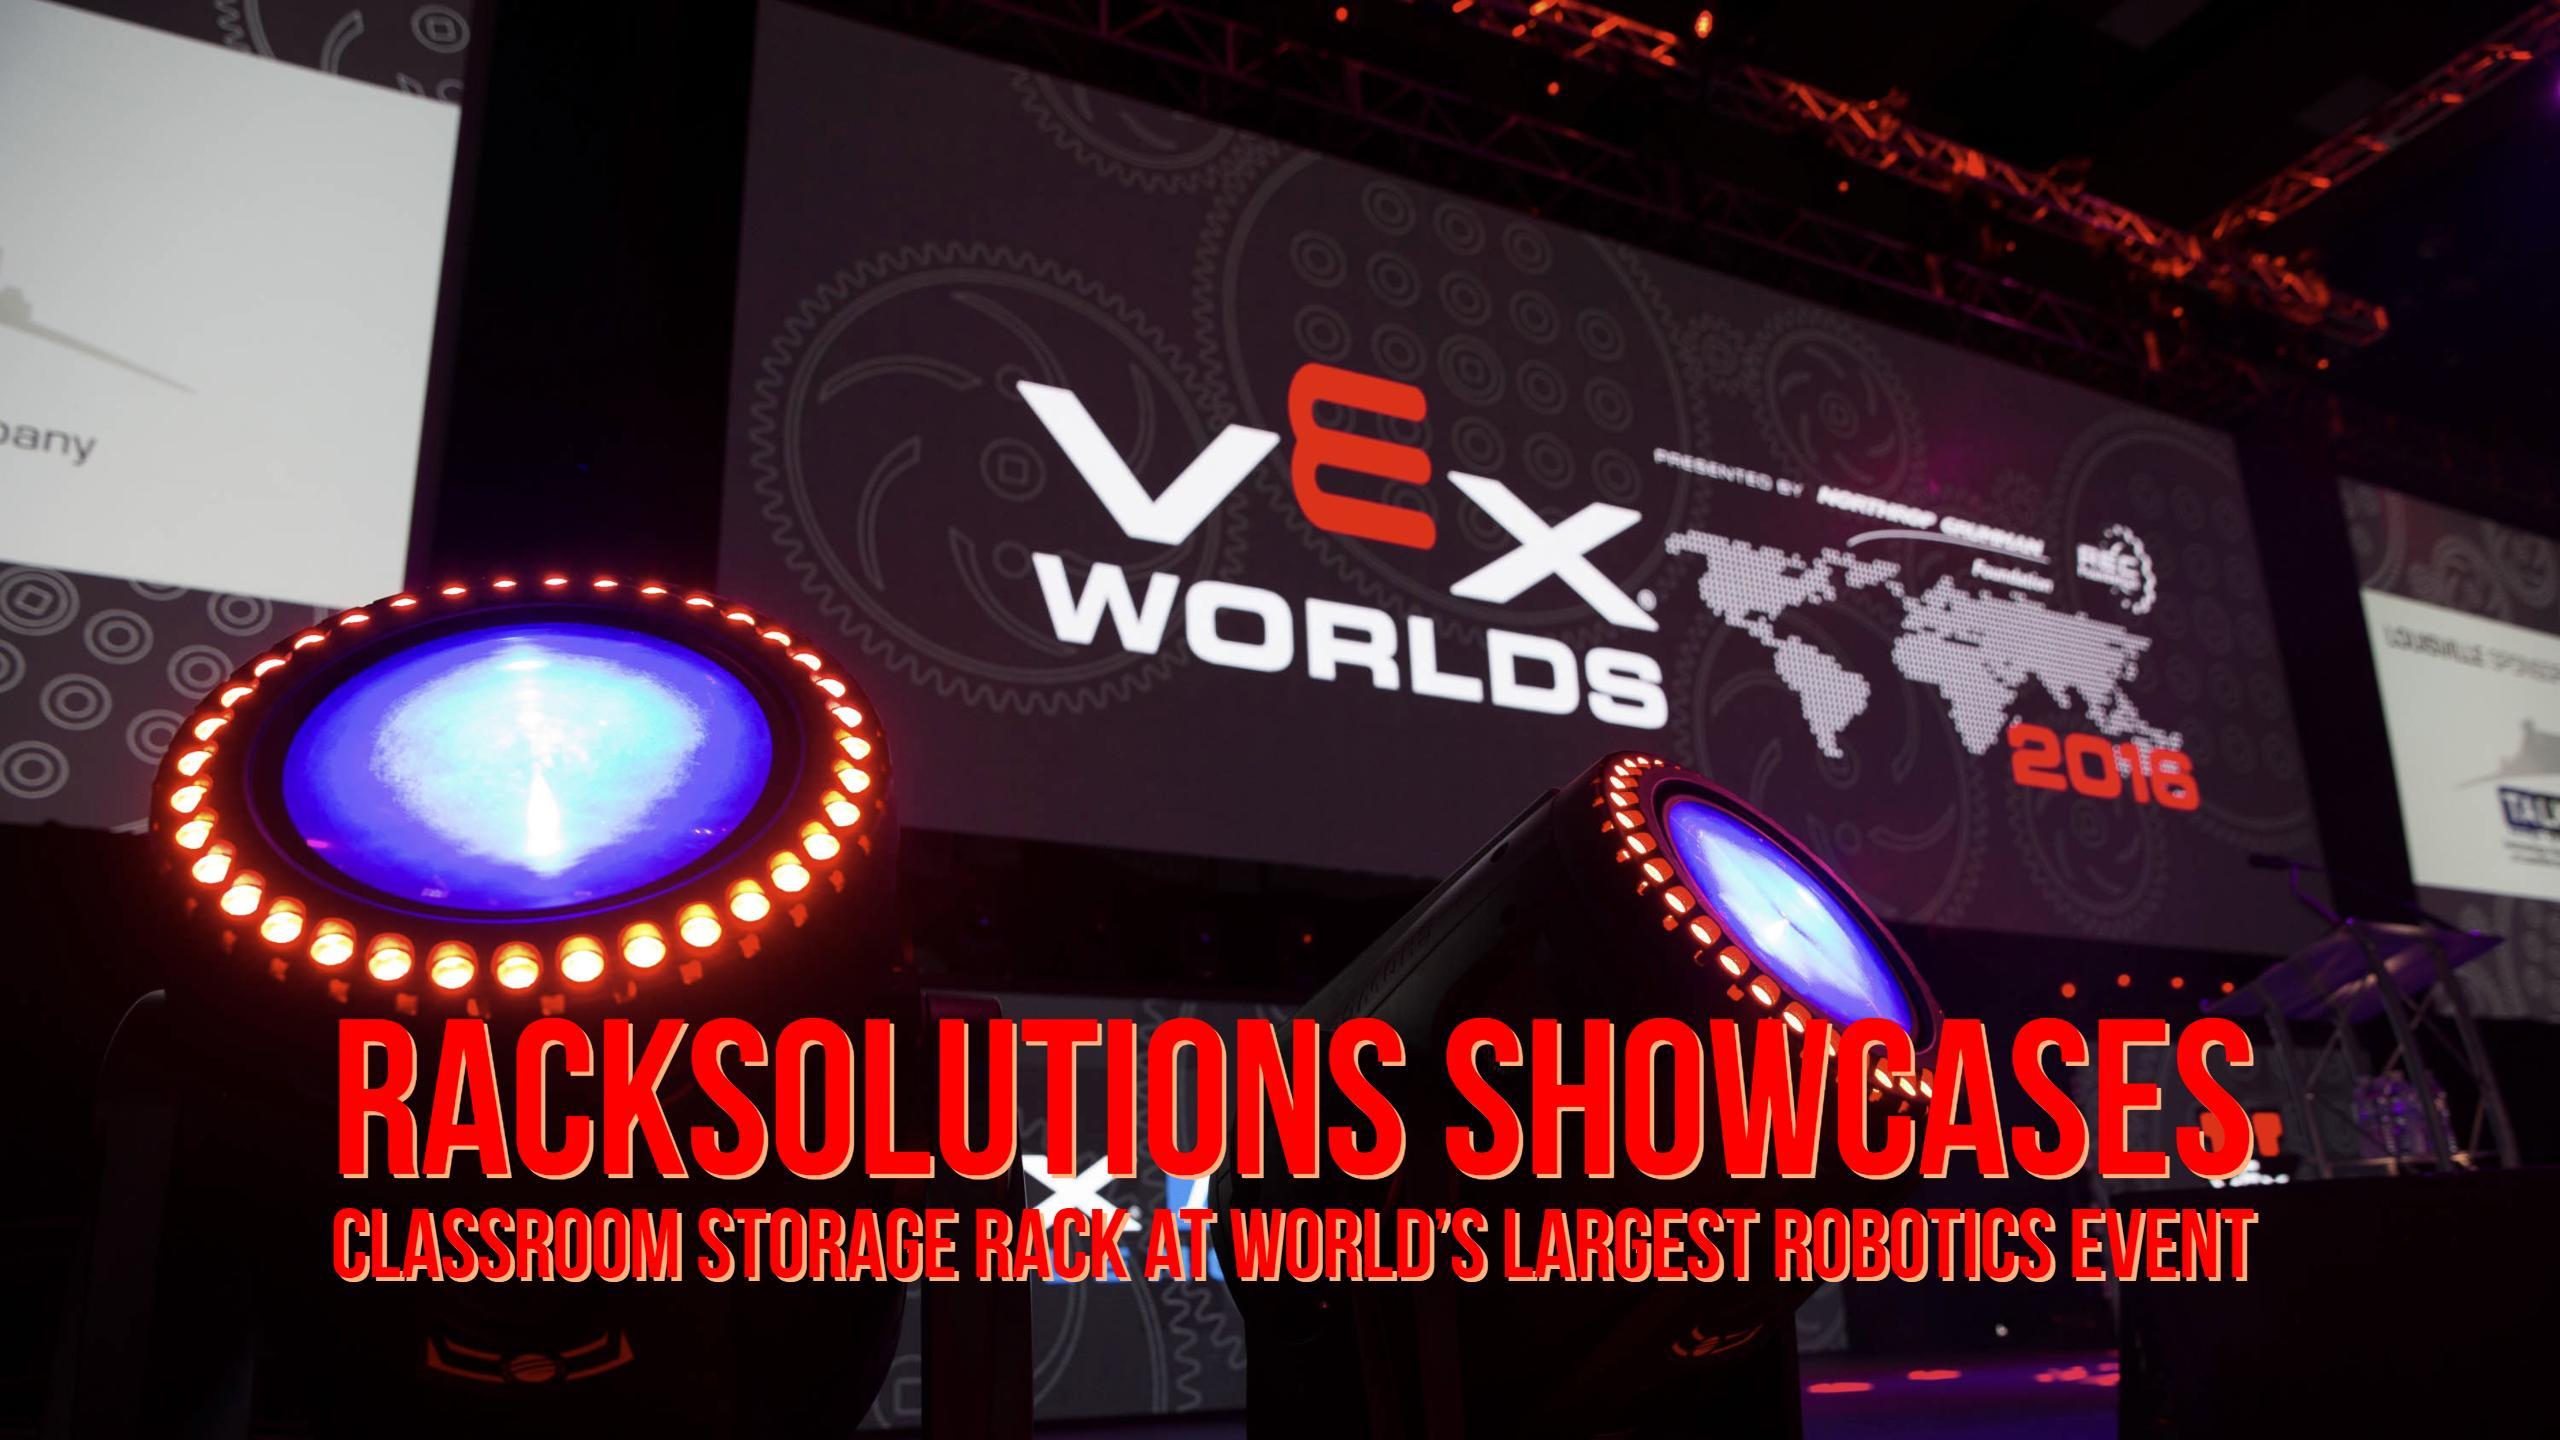 Classroom Storage Rack at World's Largest Robotics Event